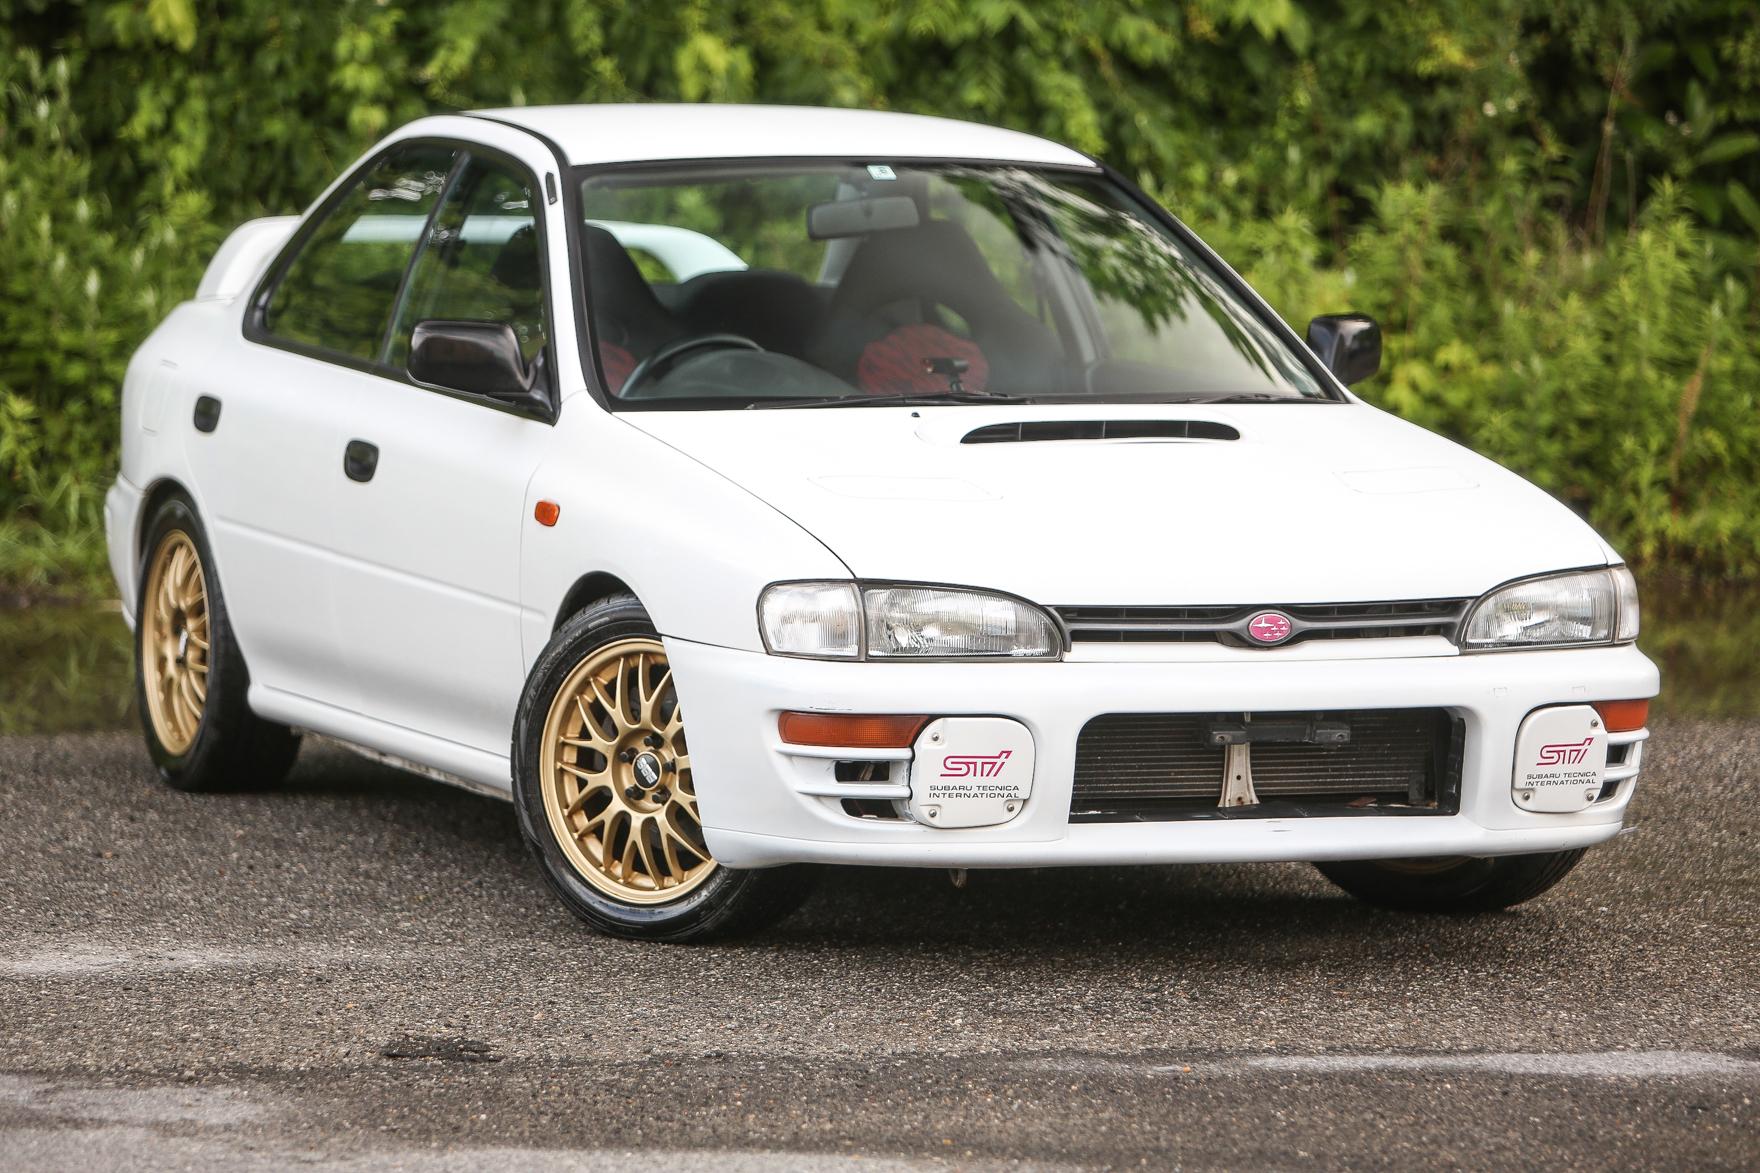 1993 Subaru Impreza WRX - $17,750